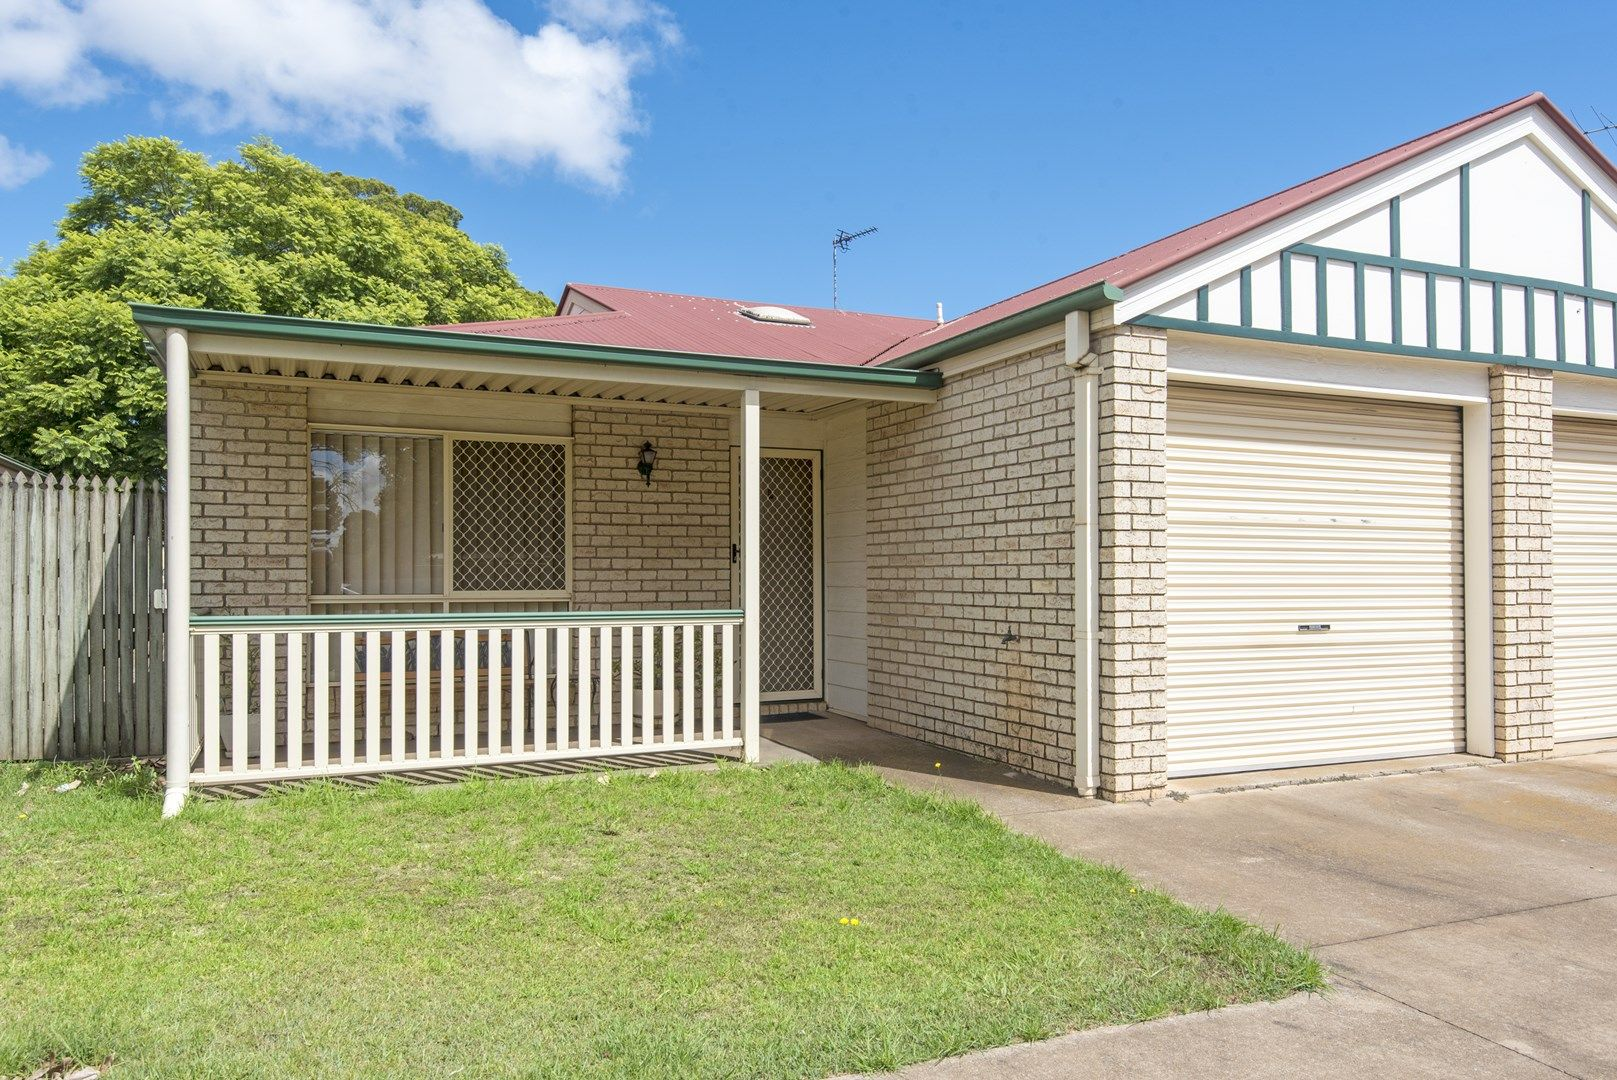 5/265 Taylor Street, Wilsonton QLD 4350, Image 0